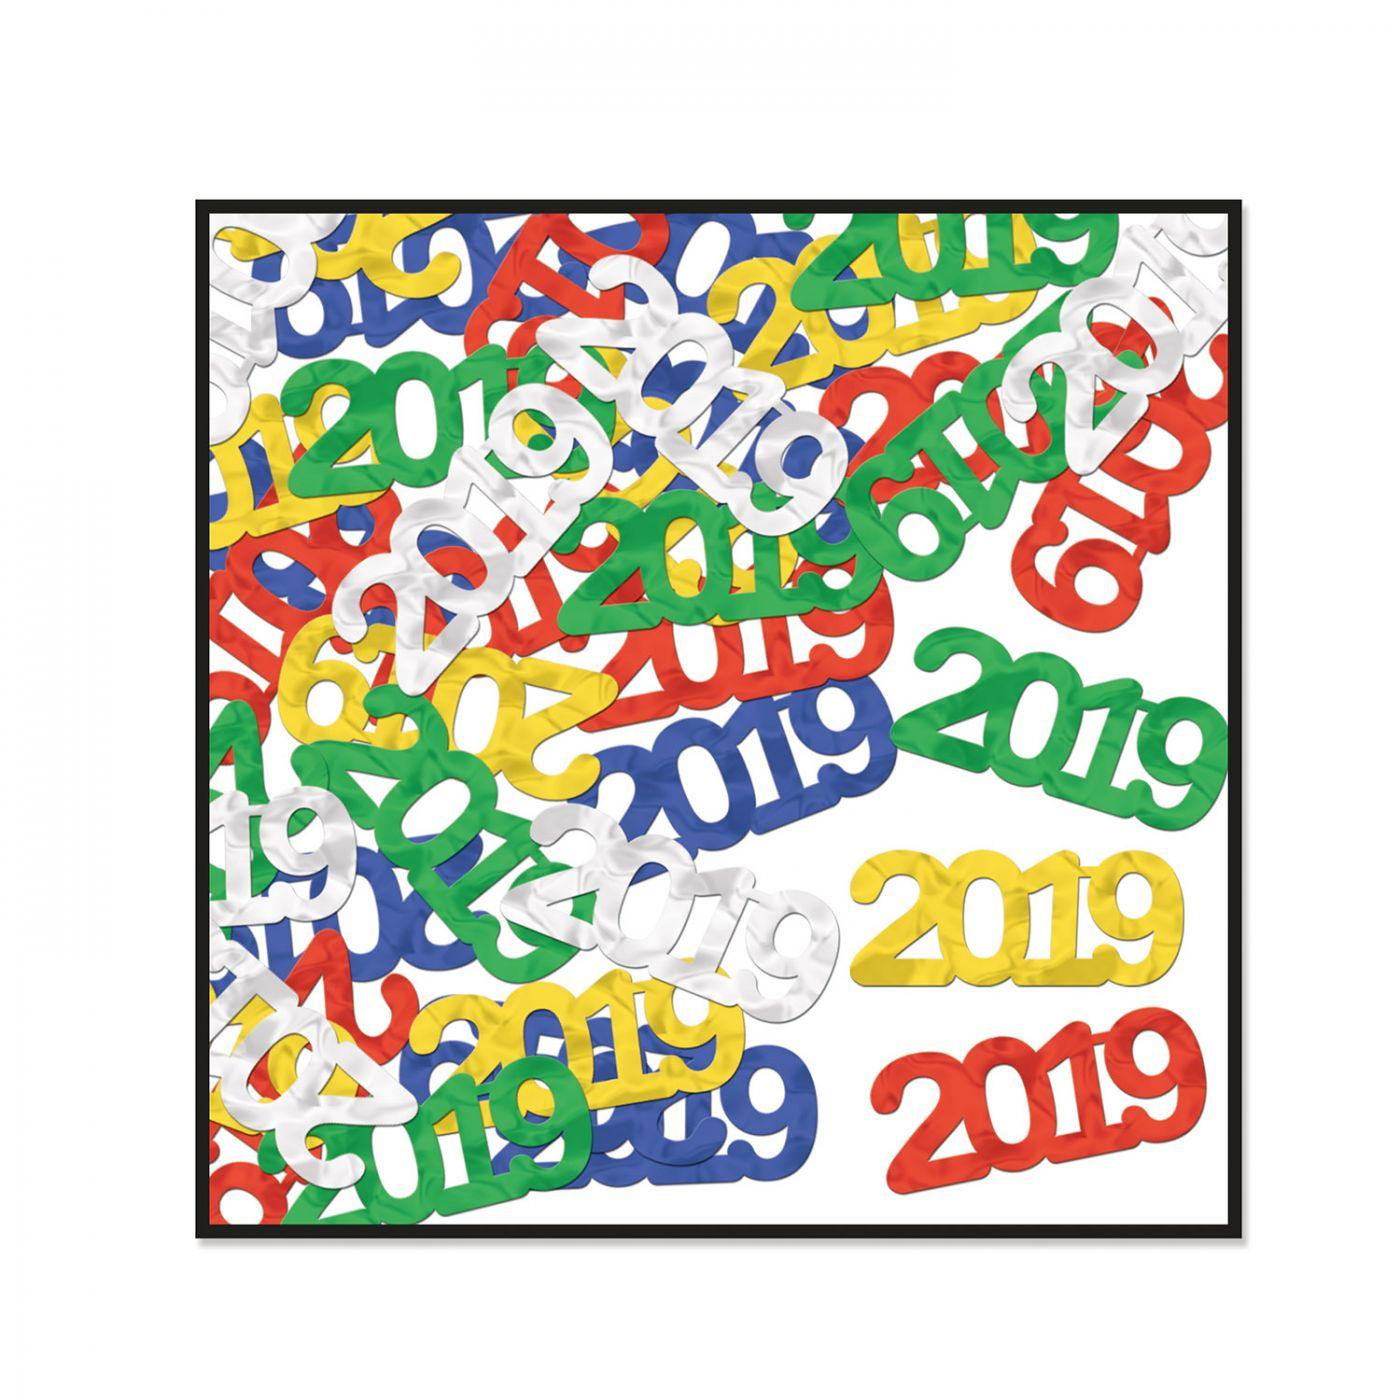 Fanci-Fetti  2019  Silhouettes image